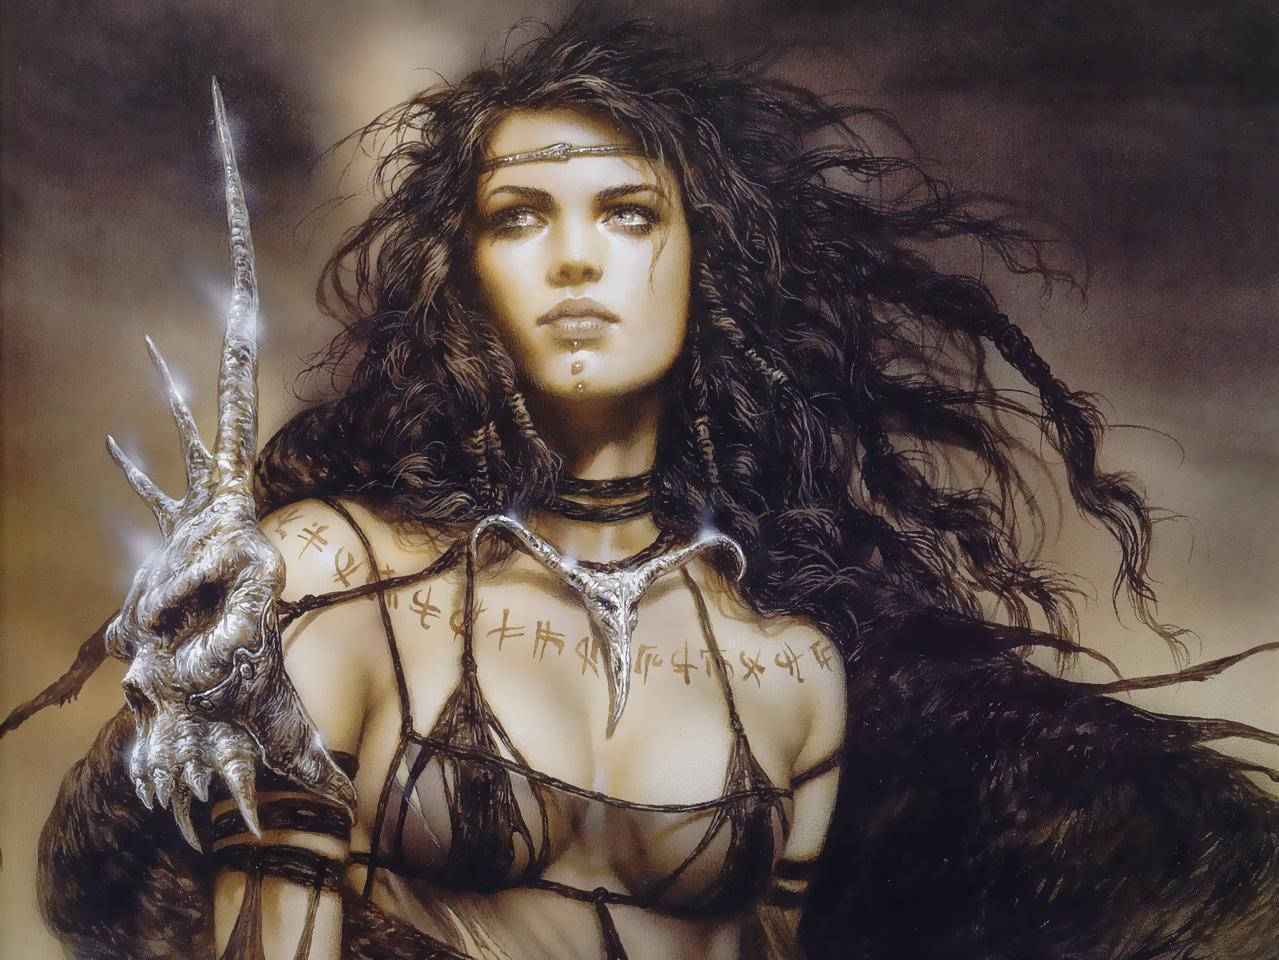 Think, fantasy warrior girl